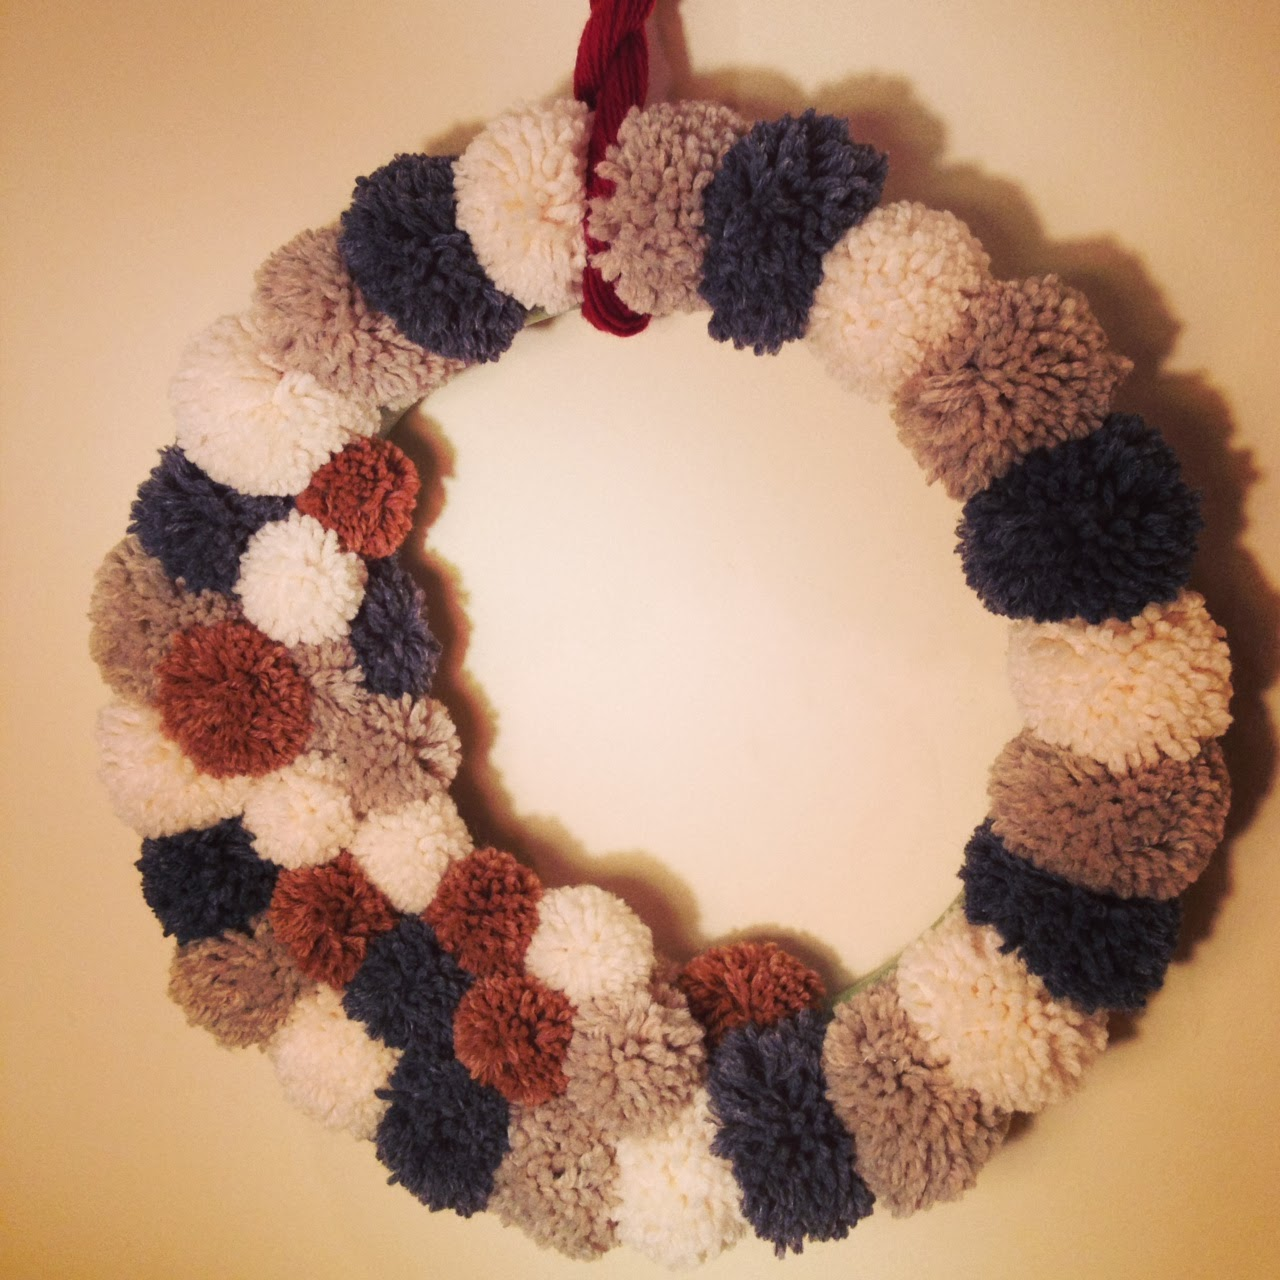 Stashbuster Cozy Winter Yarn Wreath